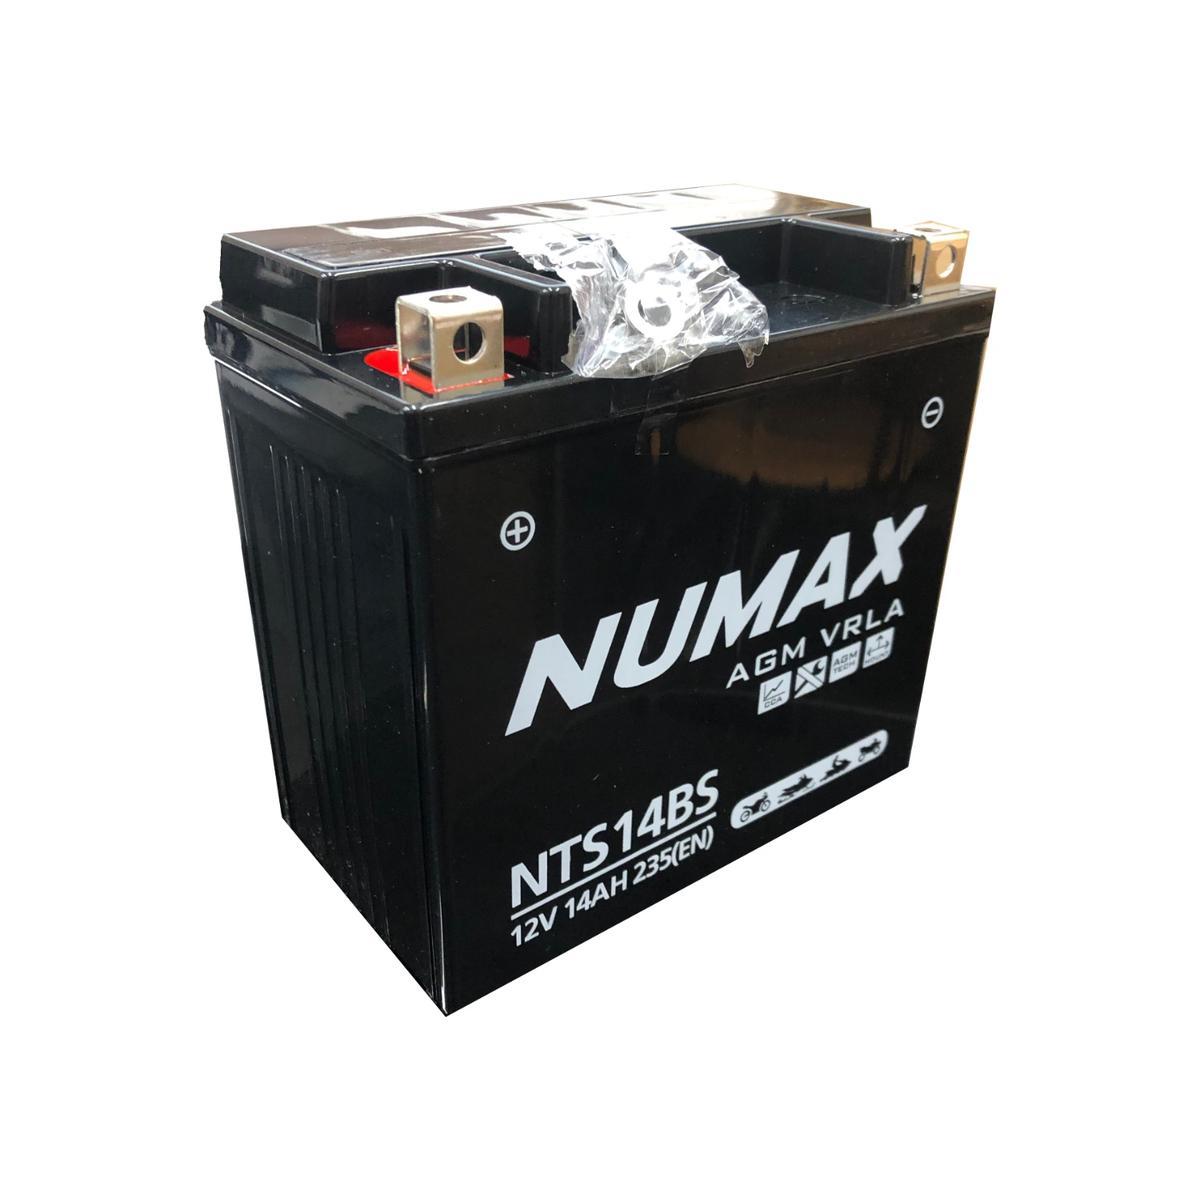 Numax NTS14BS Harley Davidson V Rod Motorbike Battery